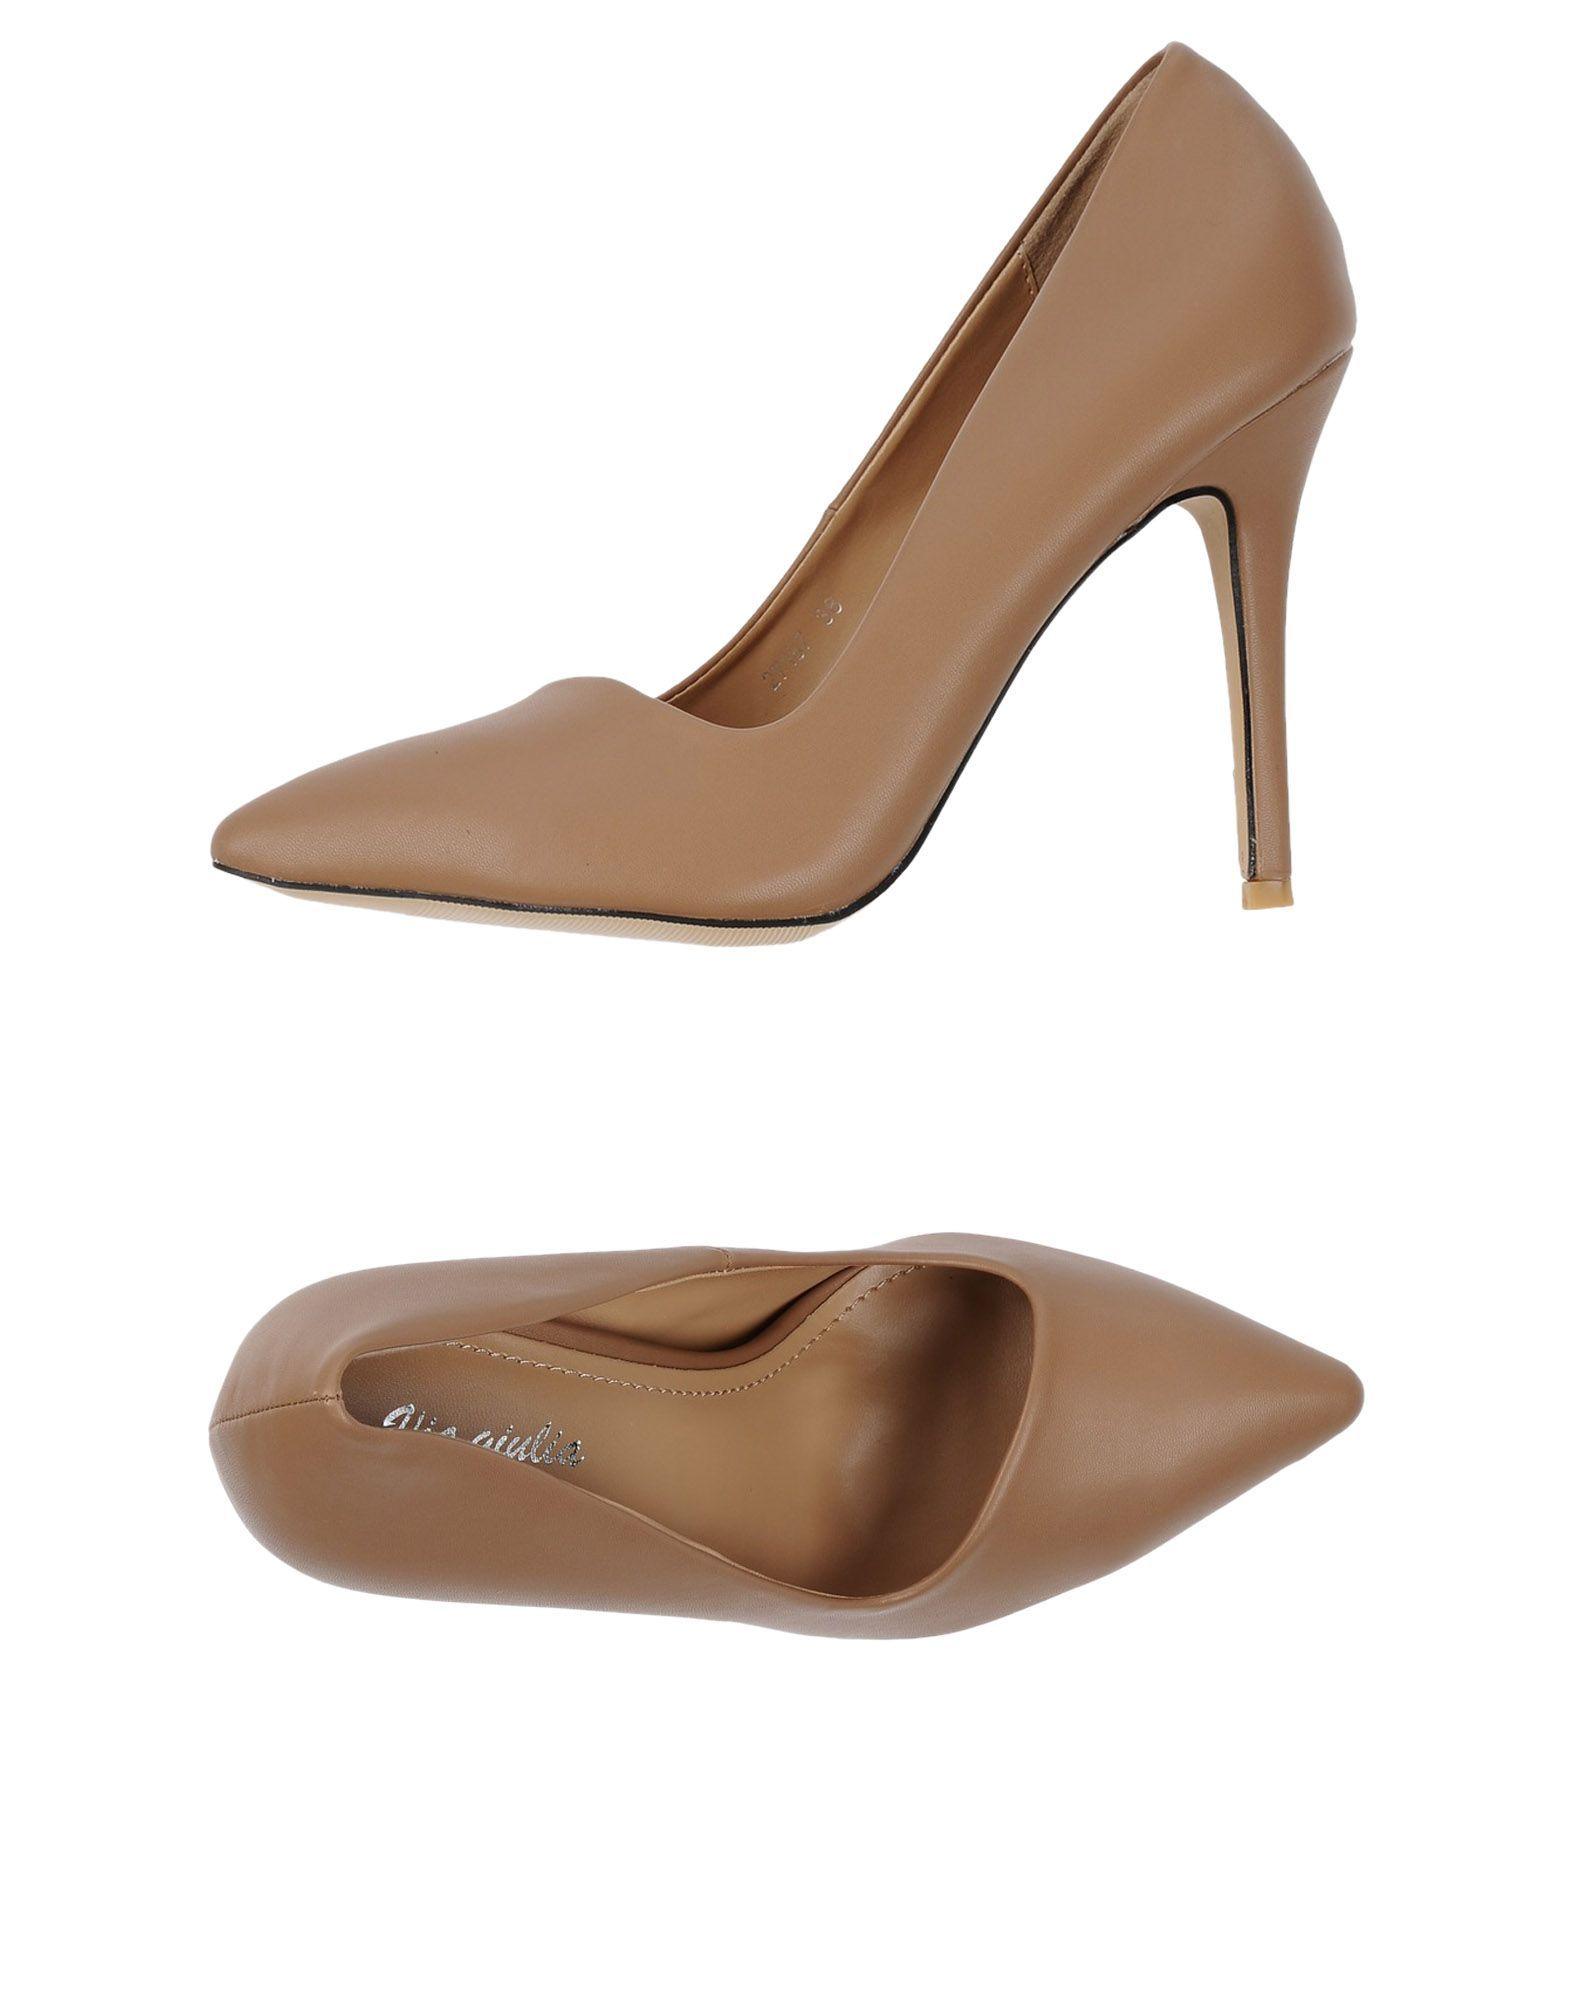 f83a9dd481e VIA GIULIA Pump | Nude Shoes For Darker Skin | Nude shoes, Pumps, Shoes